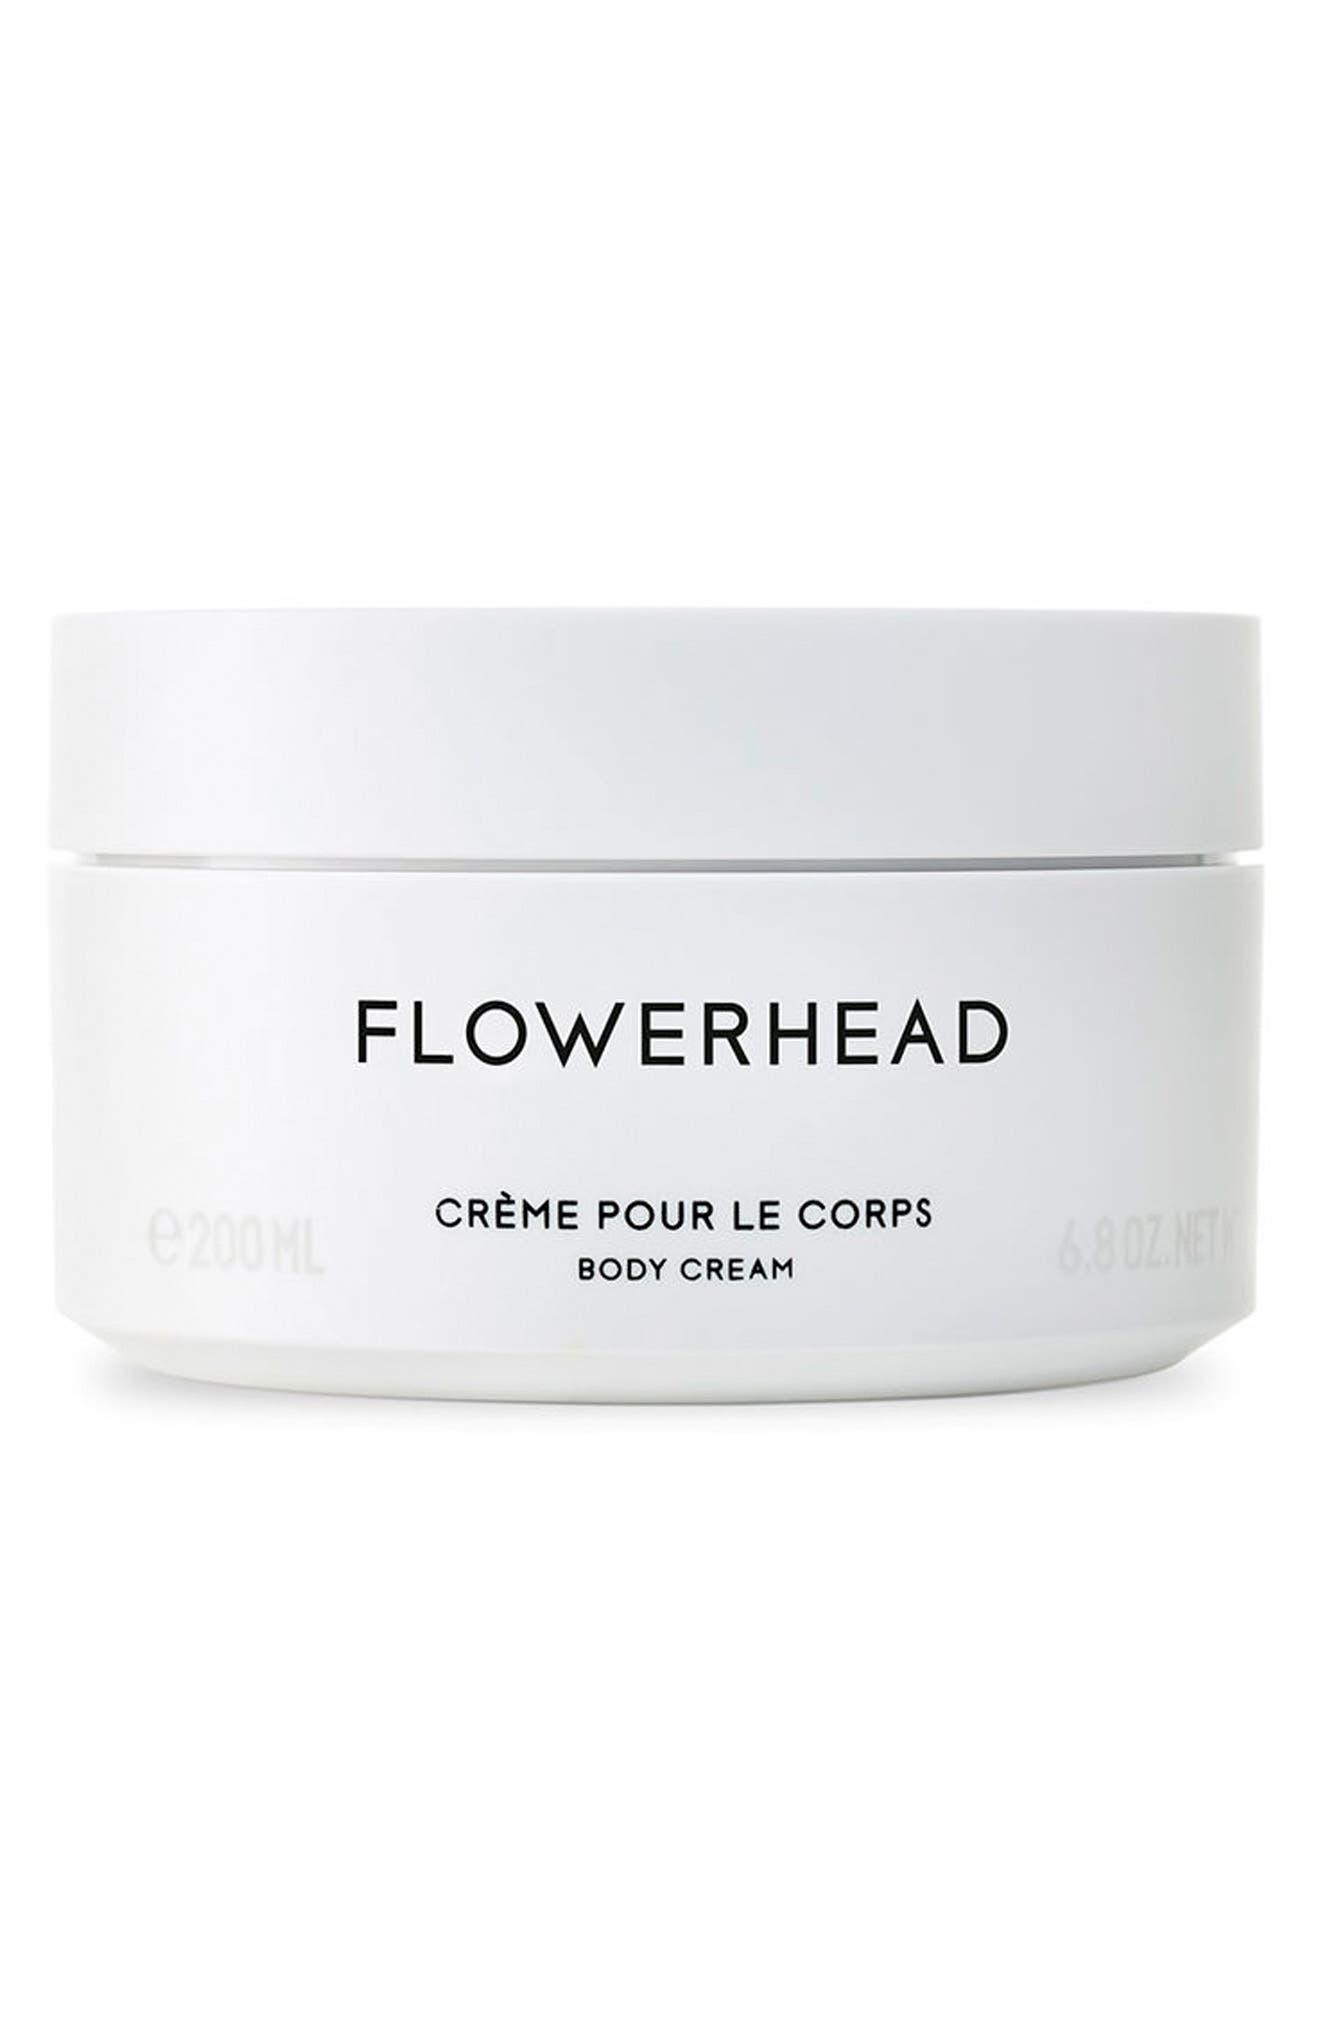 Flowerhead Body Cream,                         Main,                         color, No Color